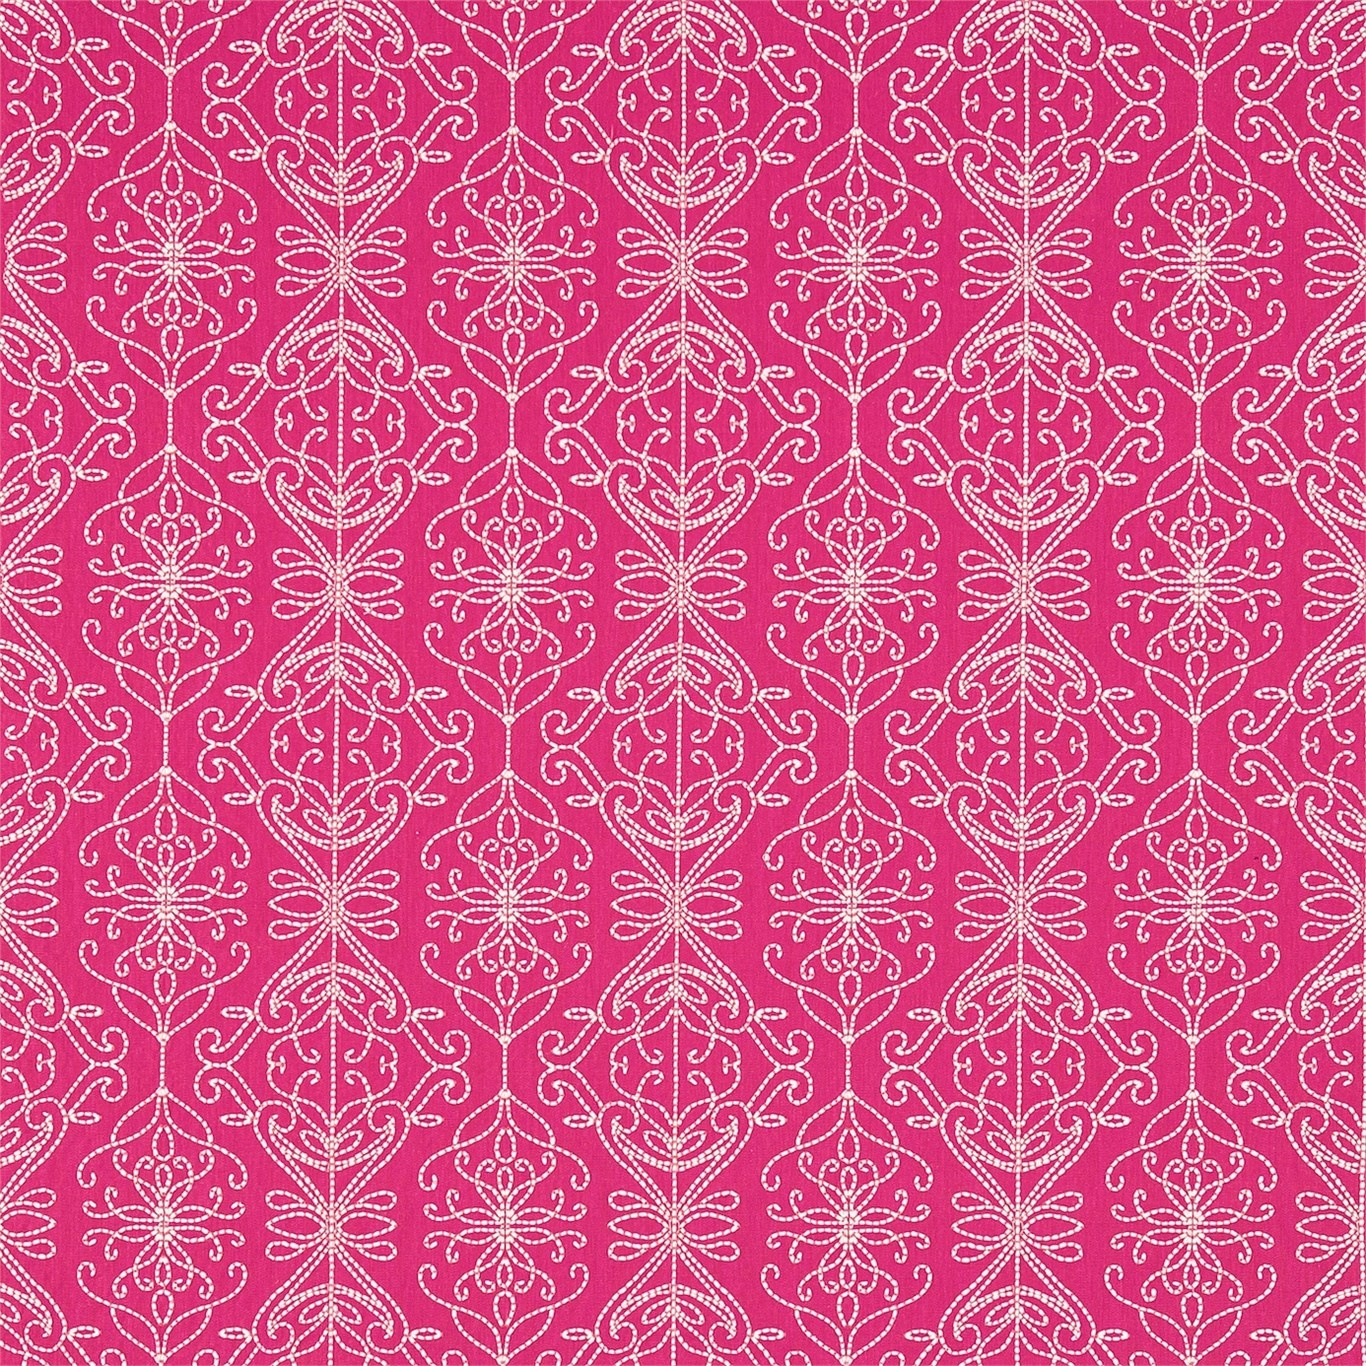 Image of Harlequin Java Flamingo/Peach Curtain Fabric 131518